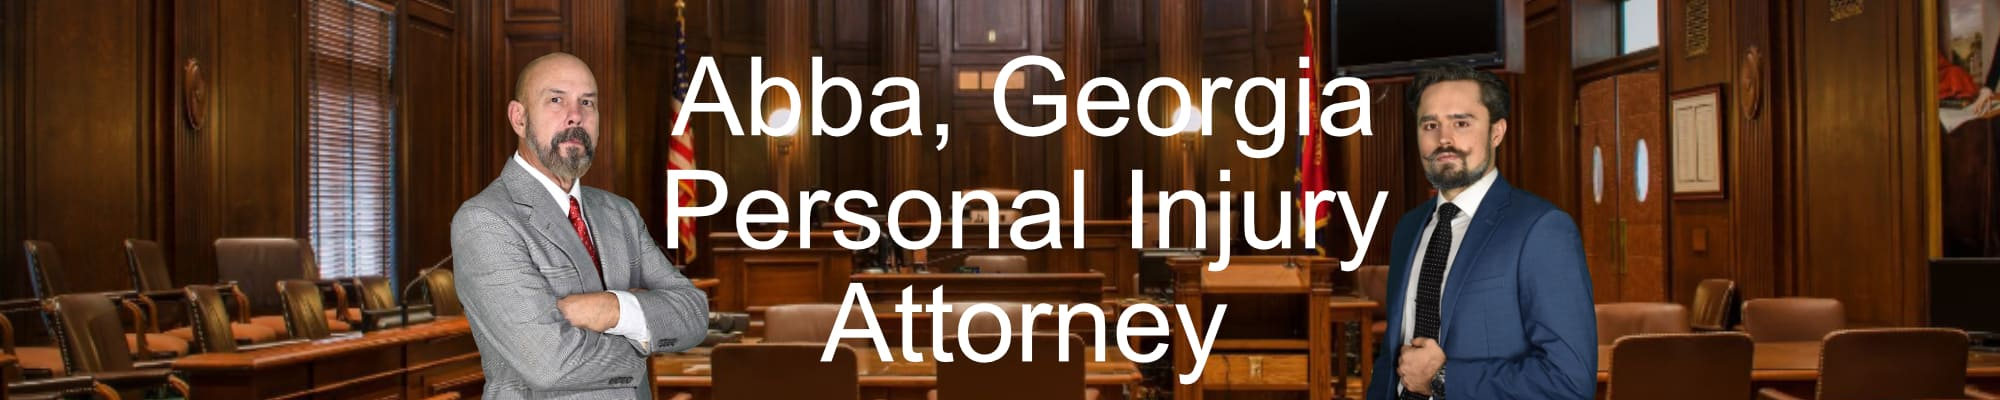 Abba-Georgia-Personal-Injury-Attorney